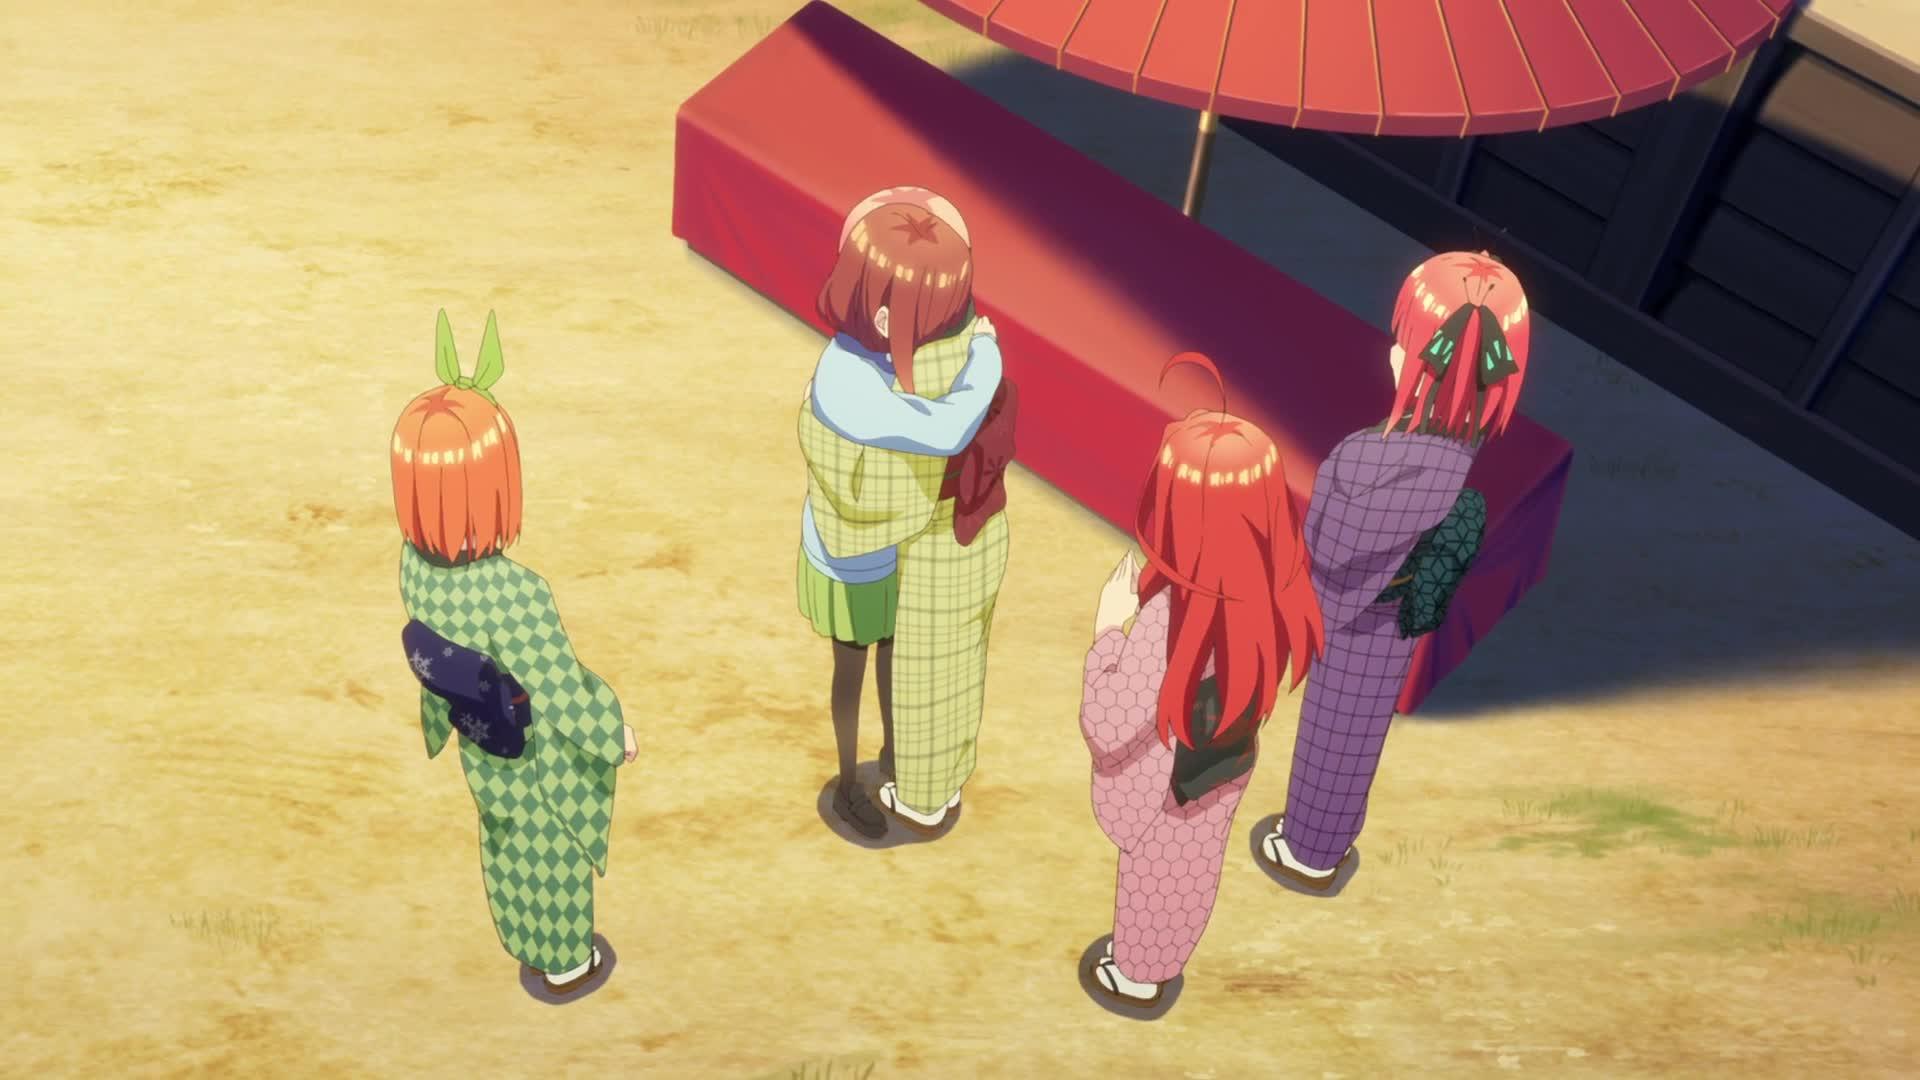 Go-Toubun no Hanayome 2 - Ep.12 - Sisters War: Part 2